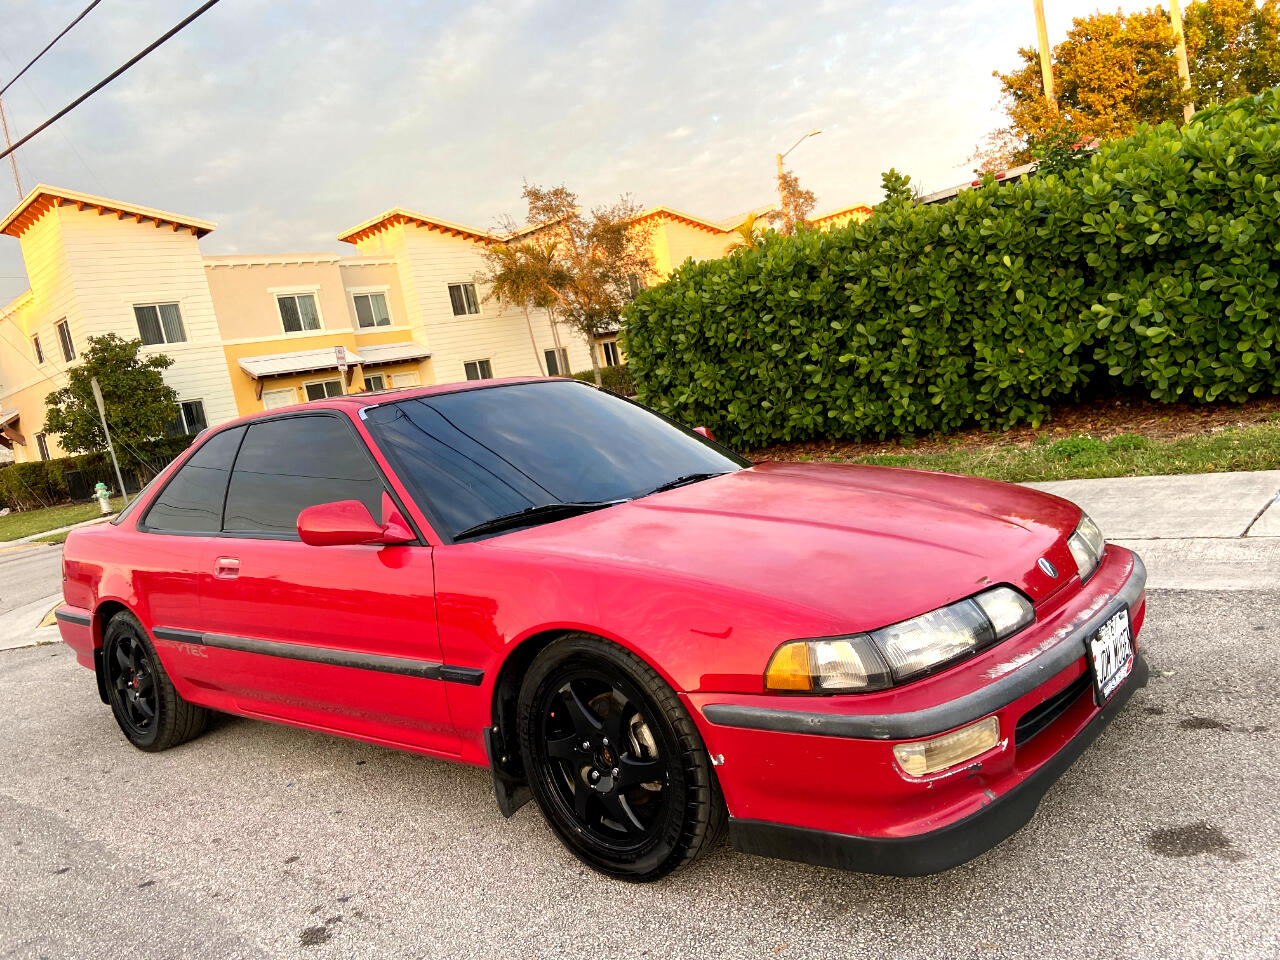 Acura Integra LS Coupe 1992